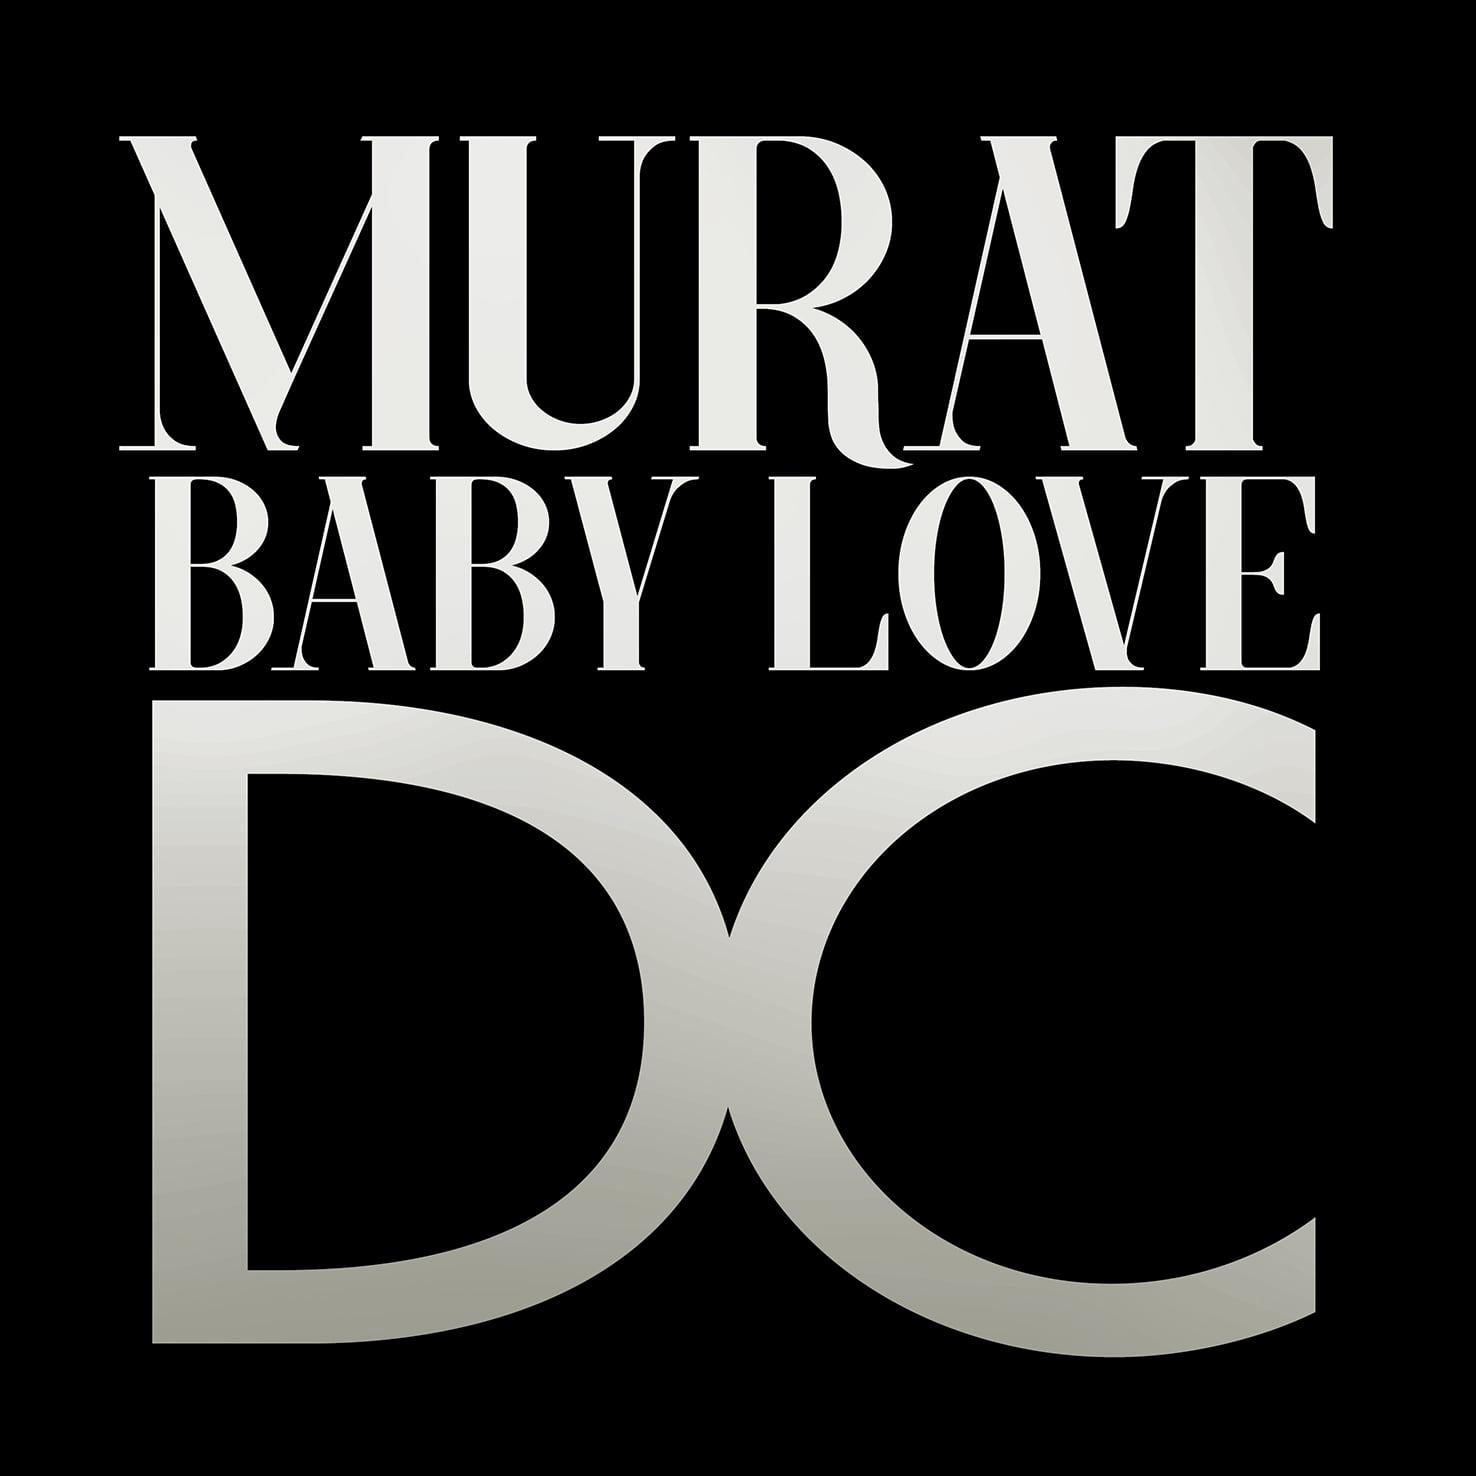 Baby Love DC - Jean-Louis Murat